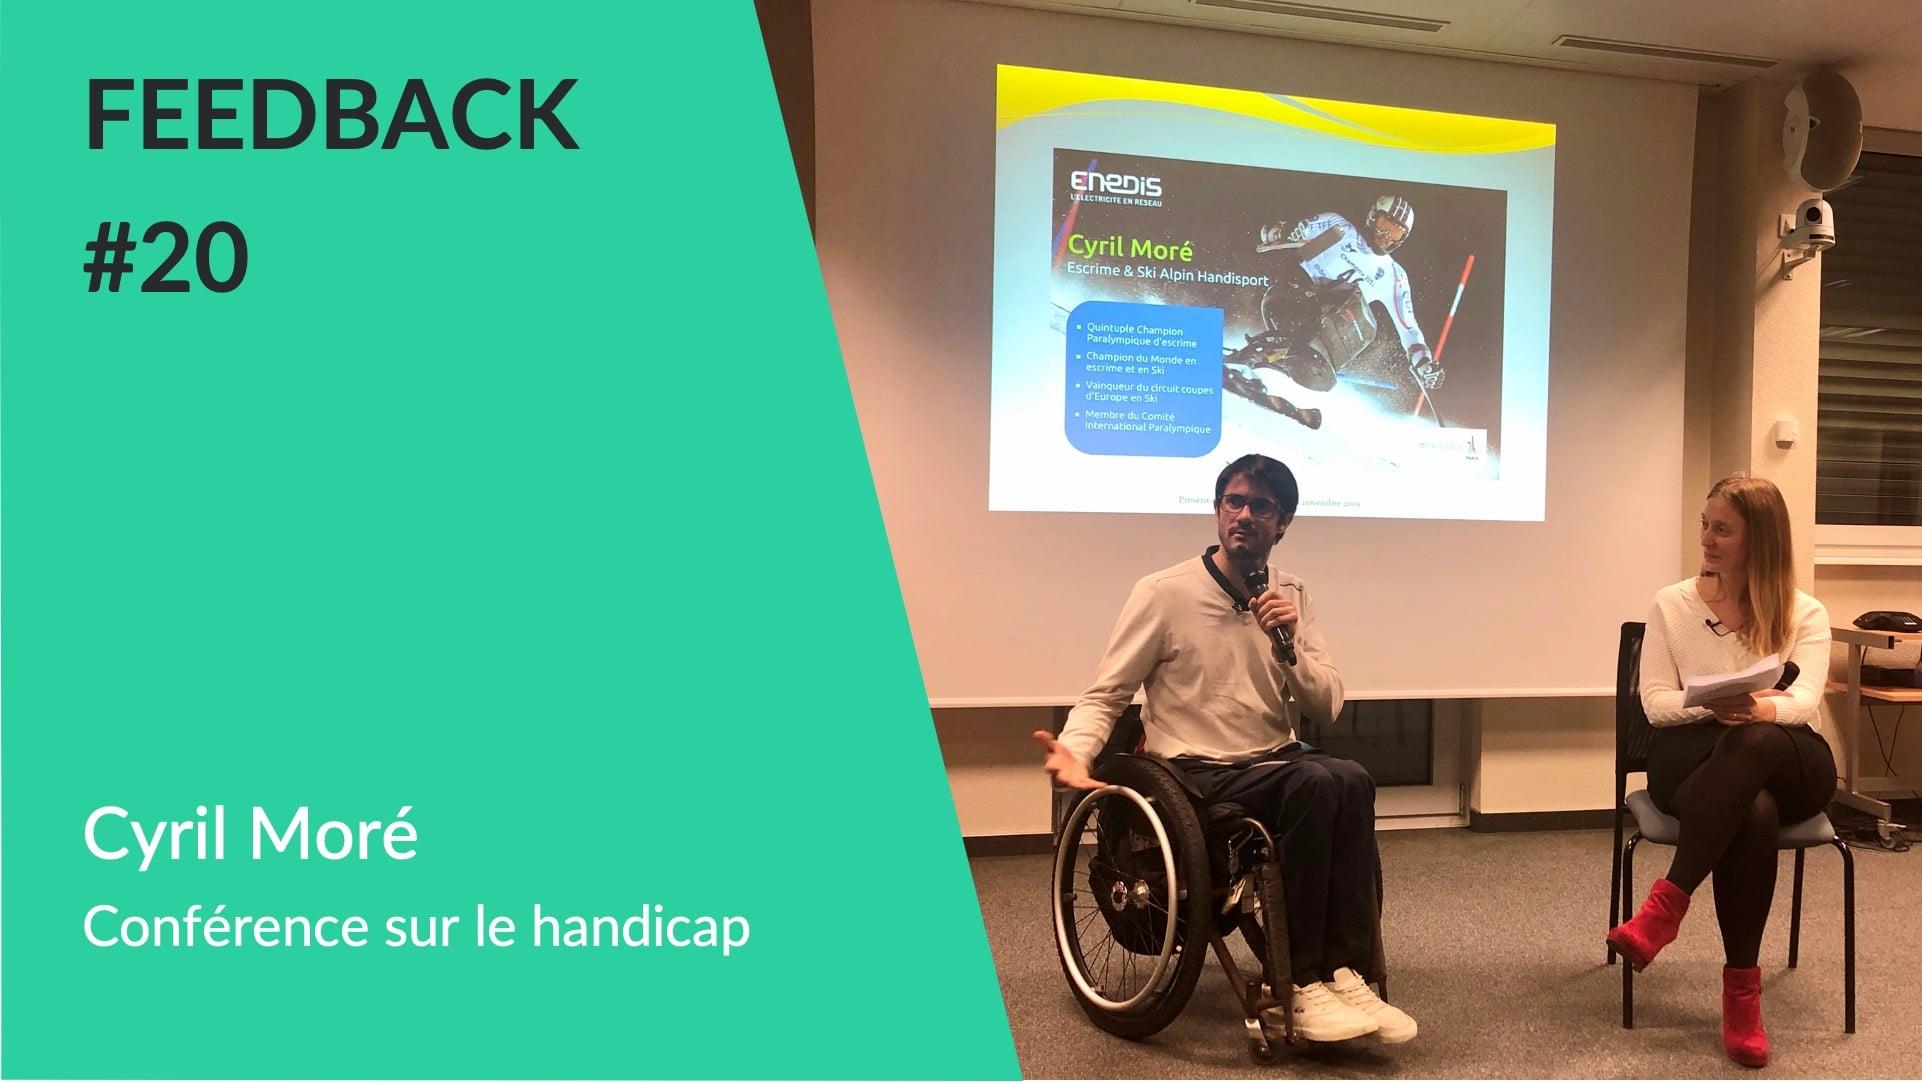 Cyril Moré Conférence handicap WeChamp - Feedback